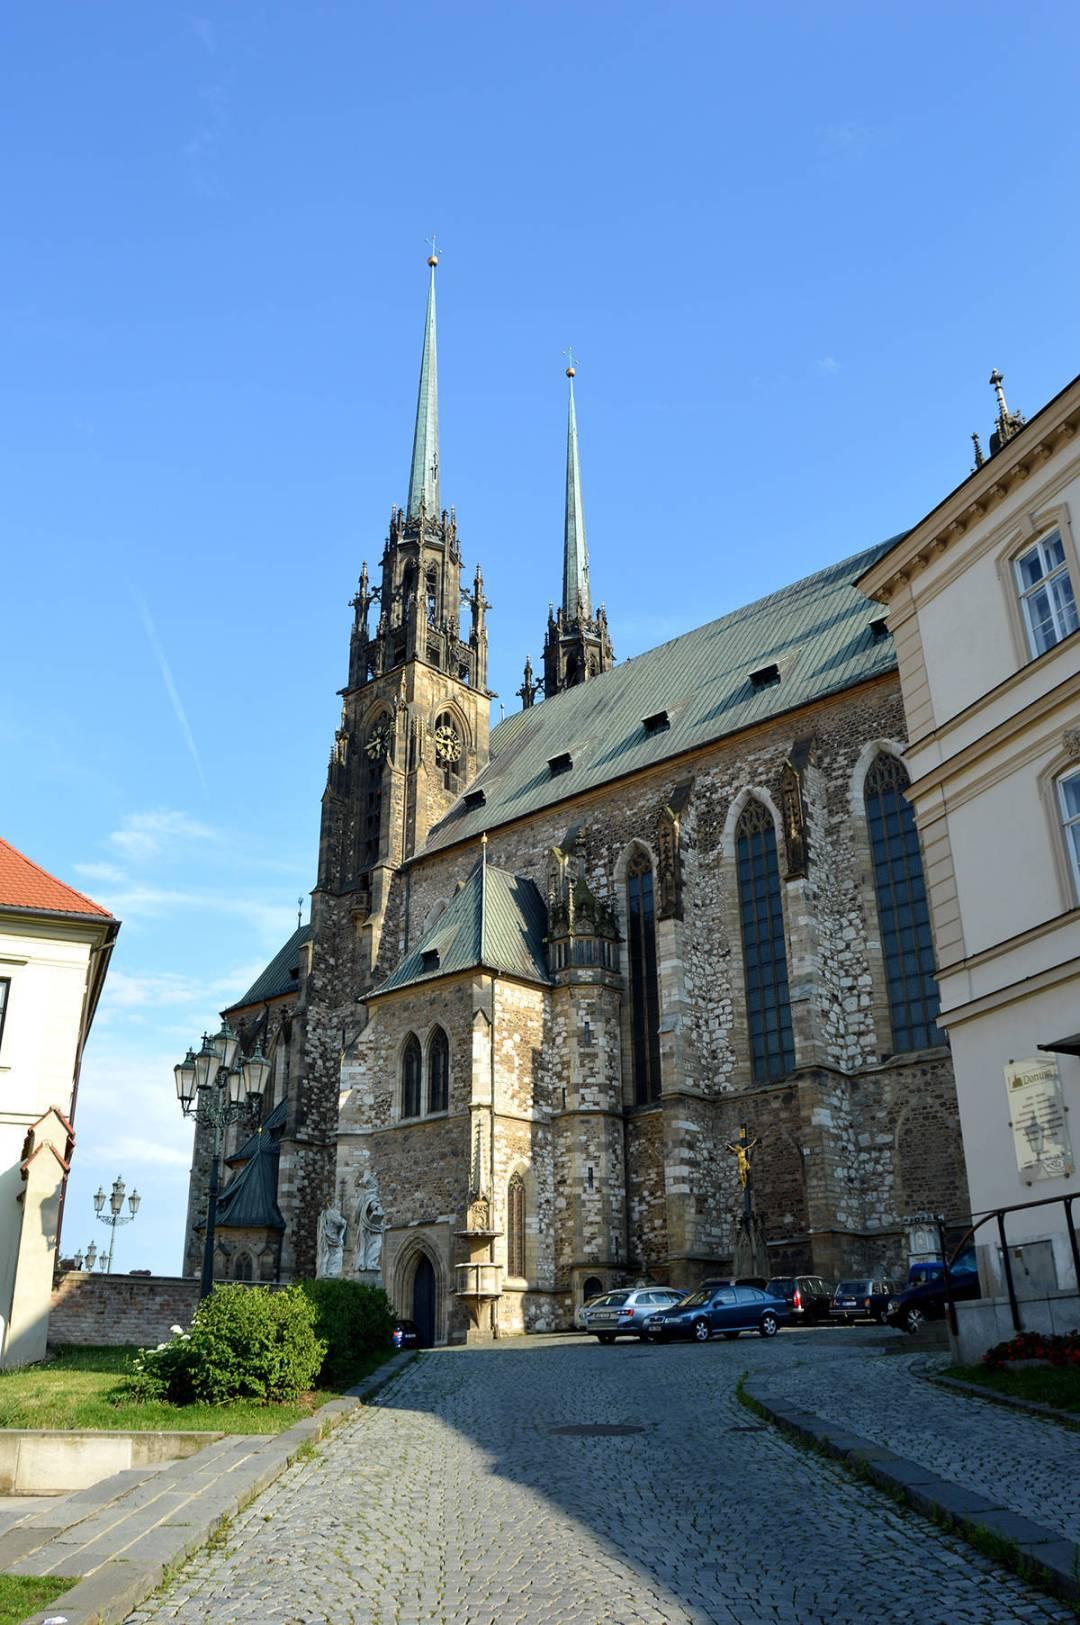 Catedrala din Brno in toata splendoarea ei